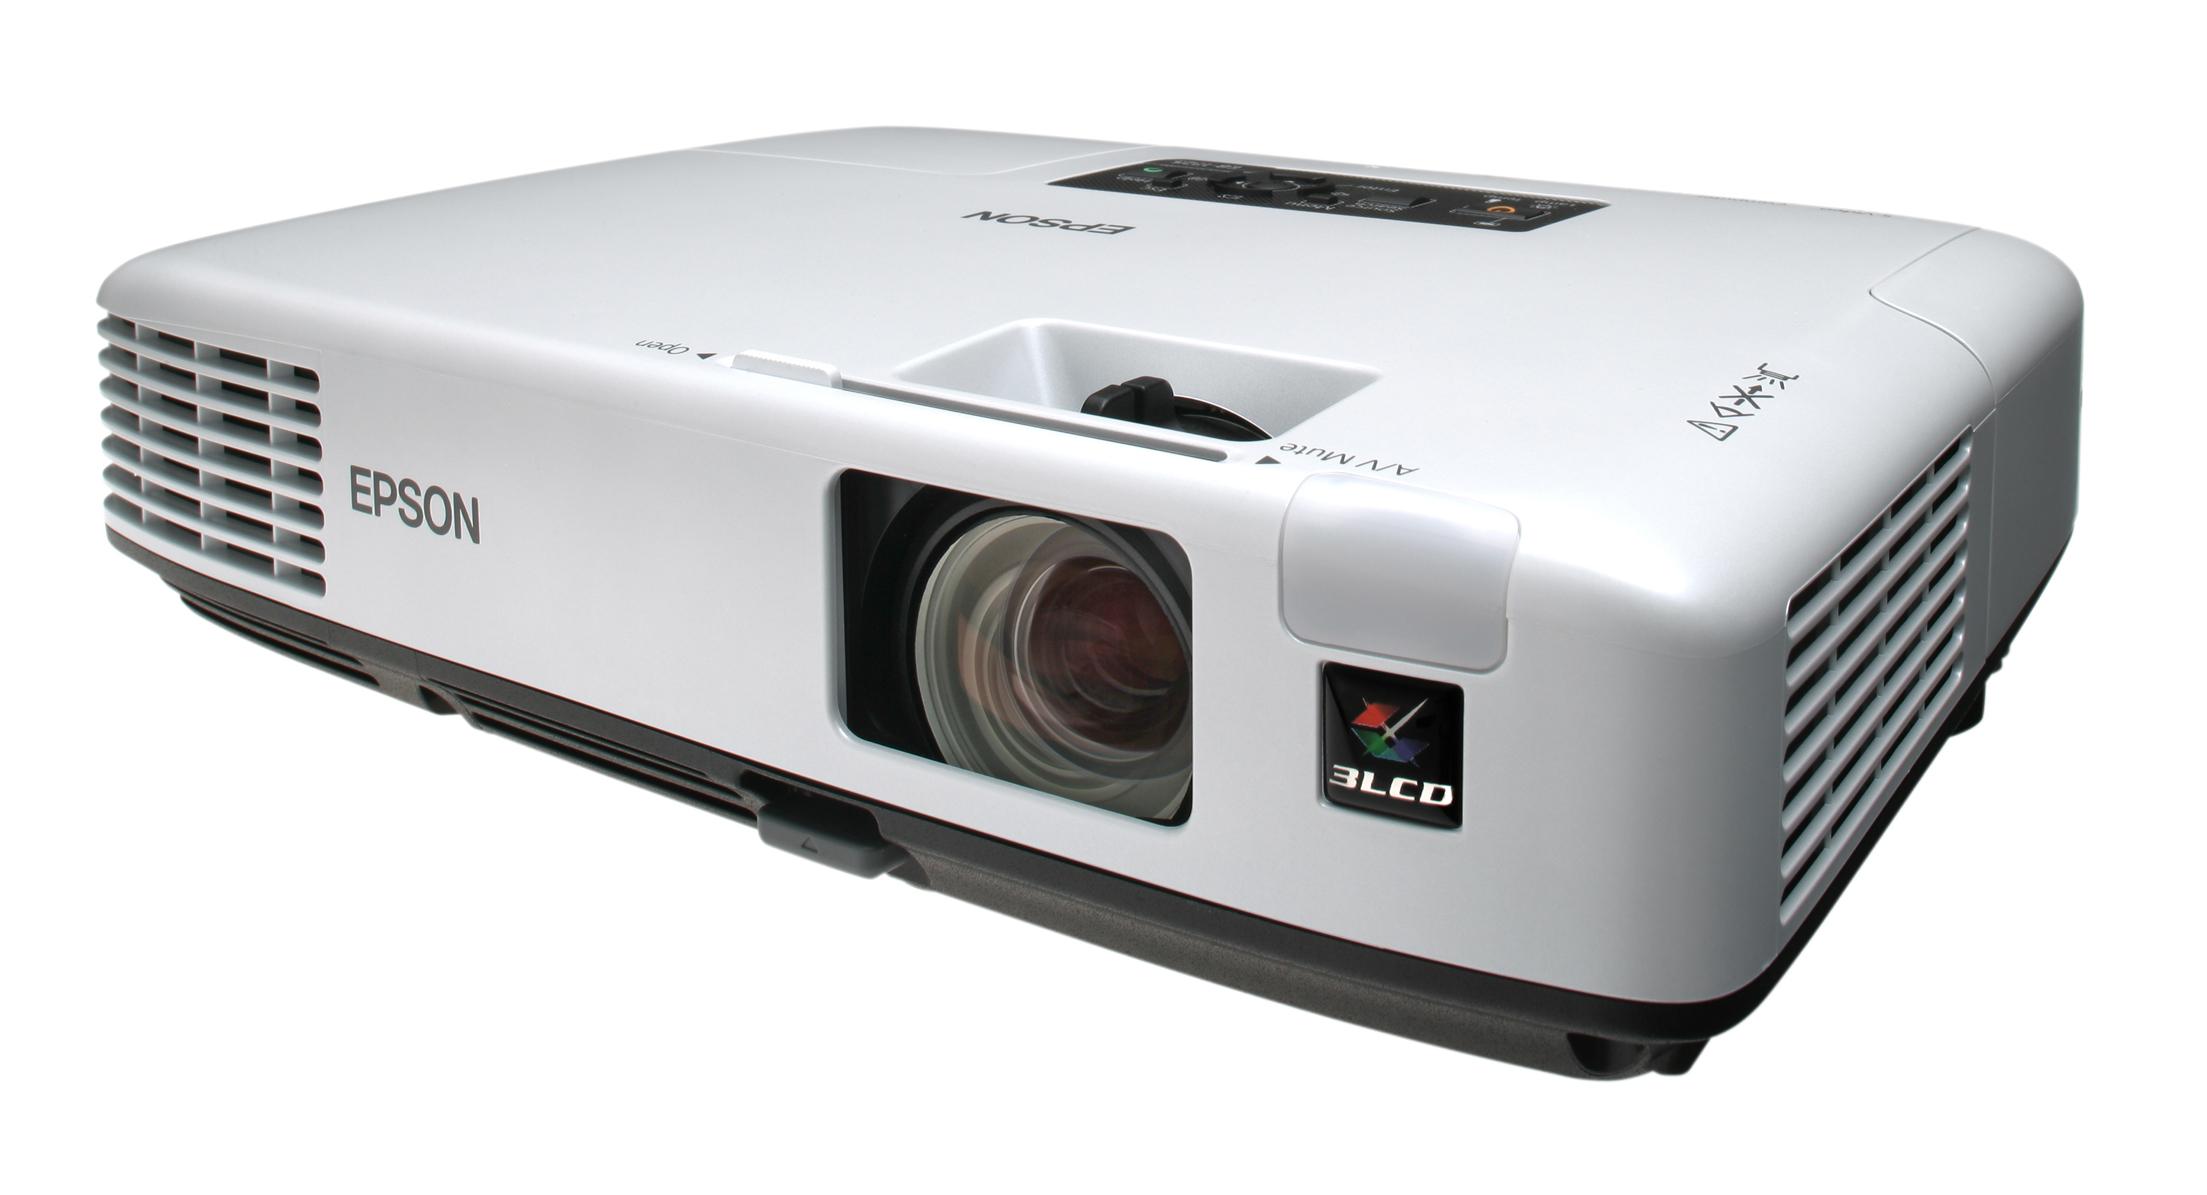 Epson Projektoren Eb 1725 Xga Lcd Beamer W04 Projector Projektor